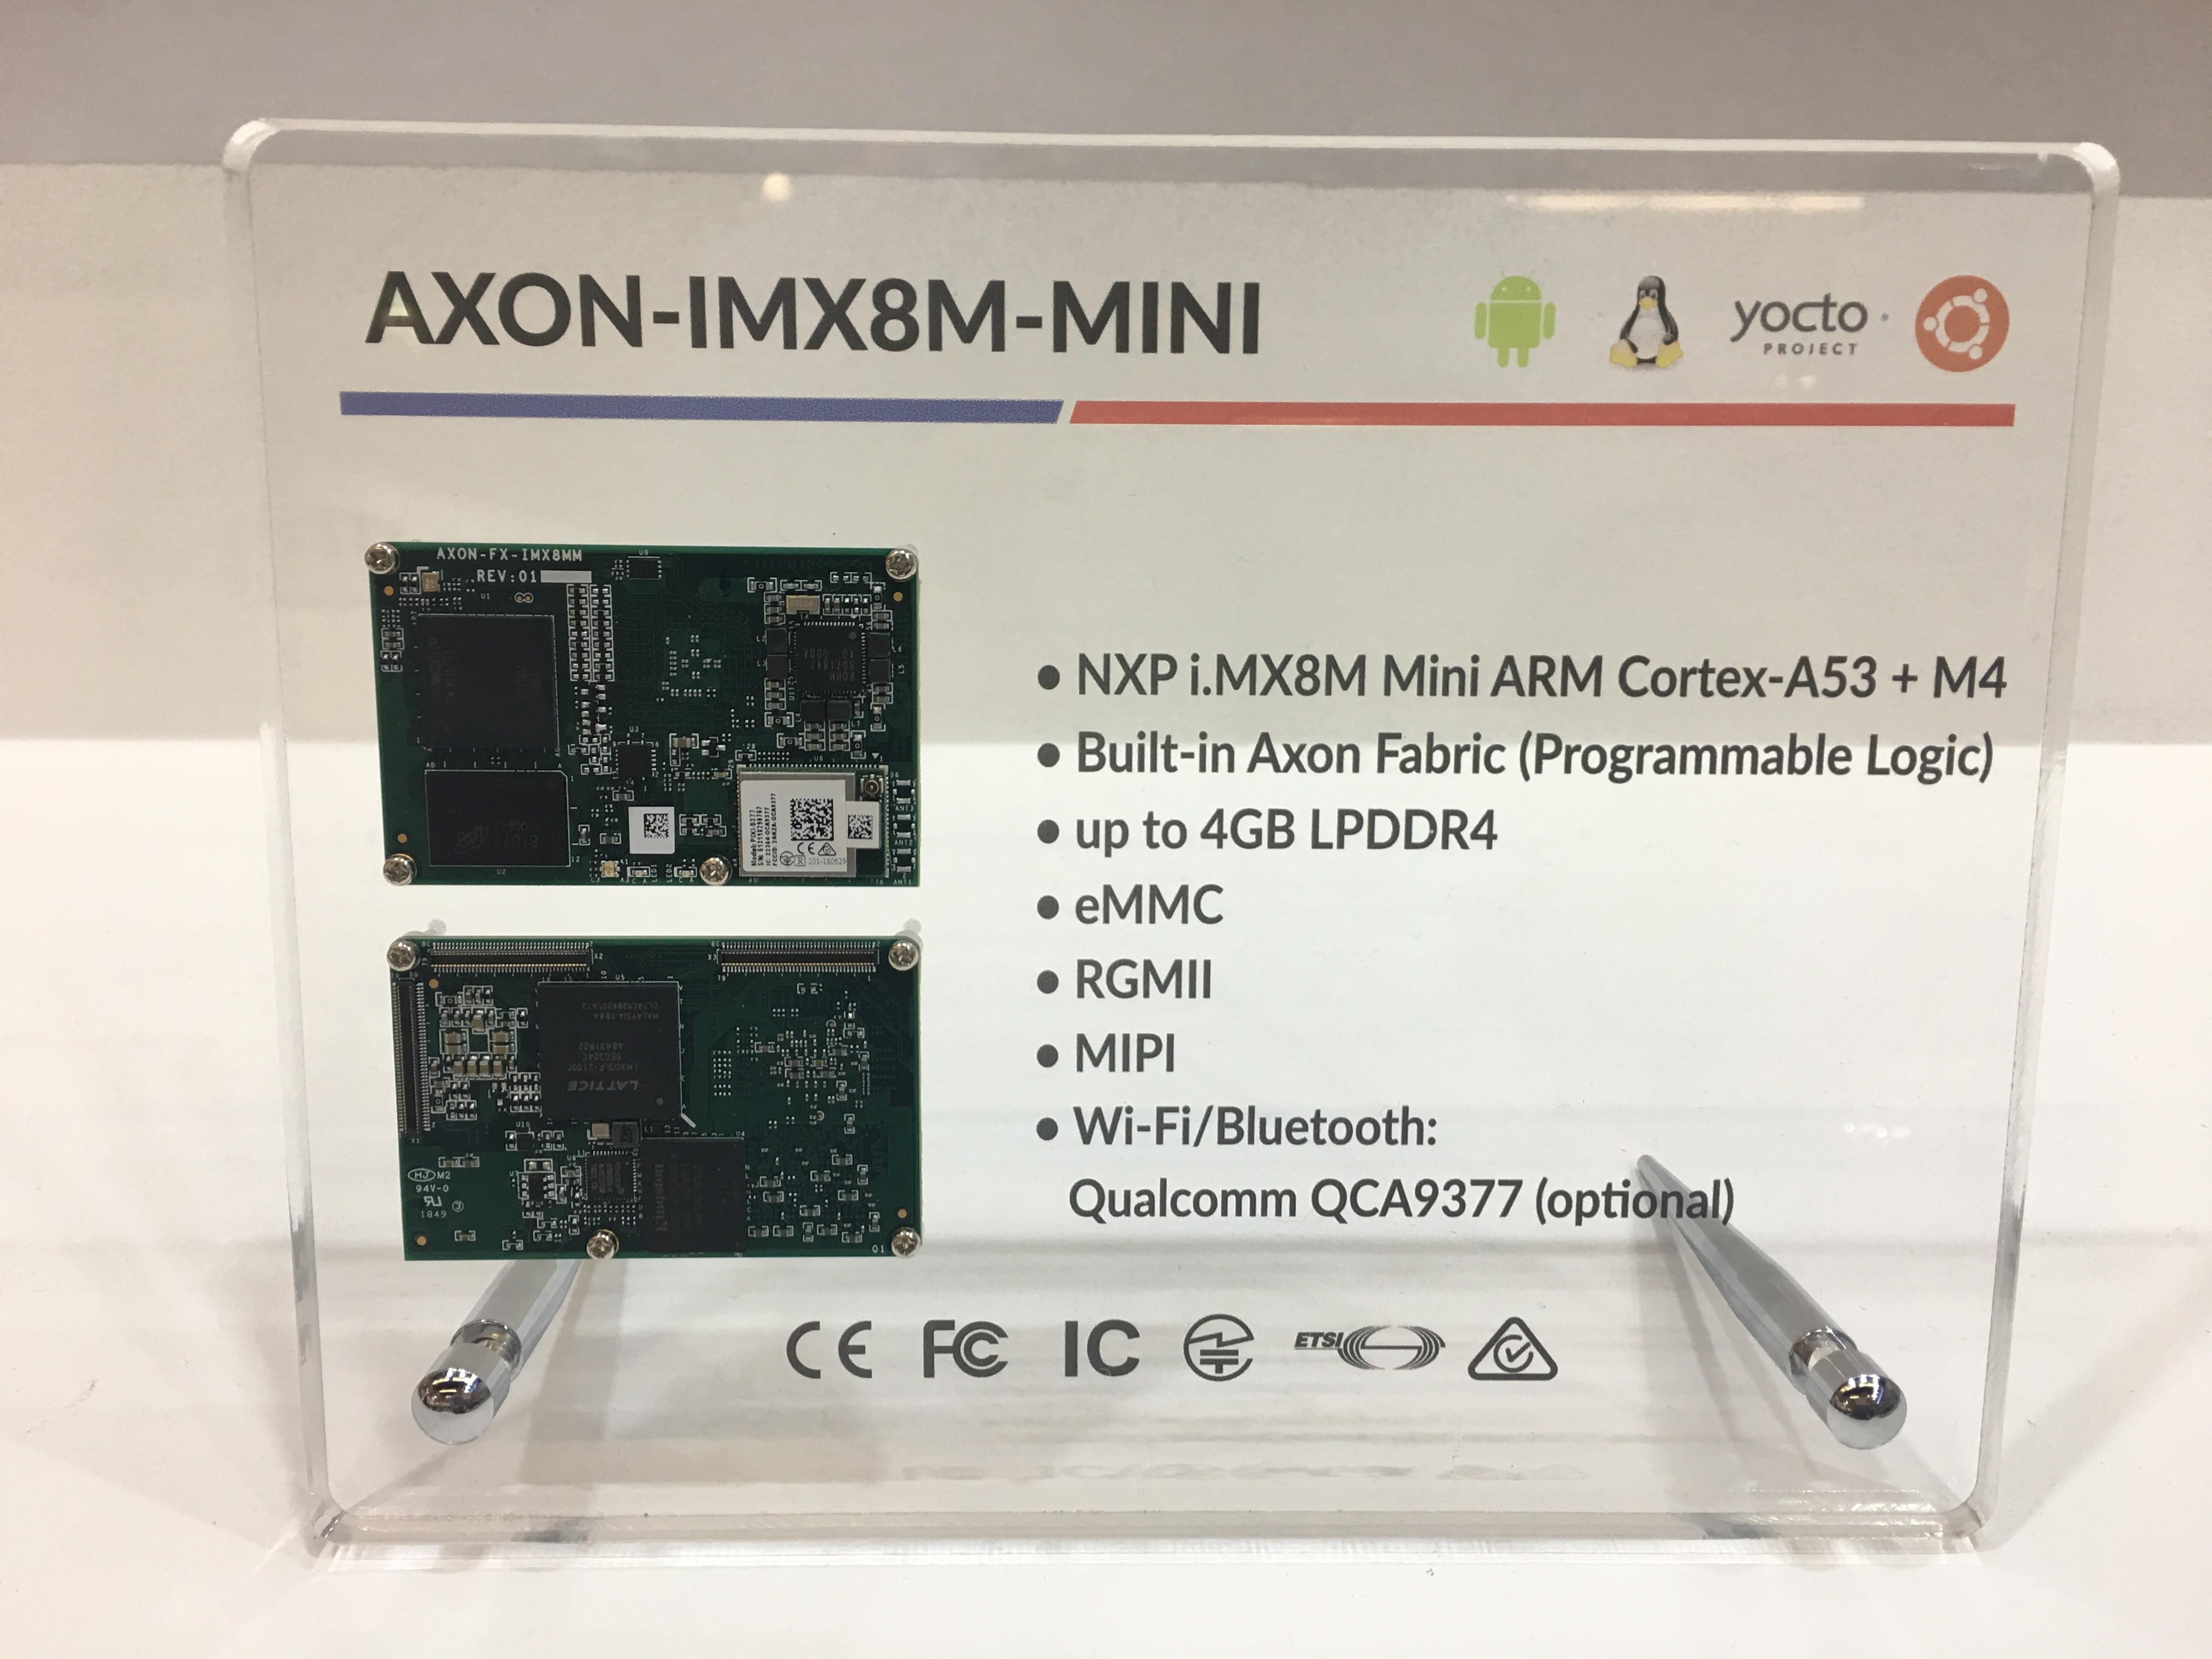 TechNexion AXON and FLEX SoM Families Feature i MX 8M Mini SoC, FPGA